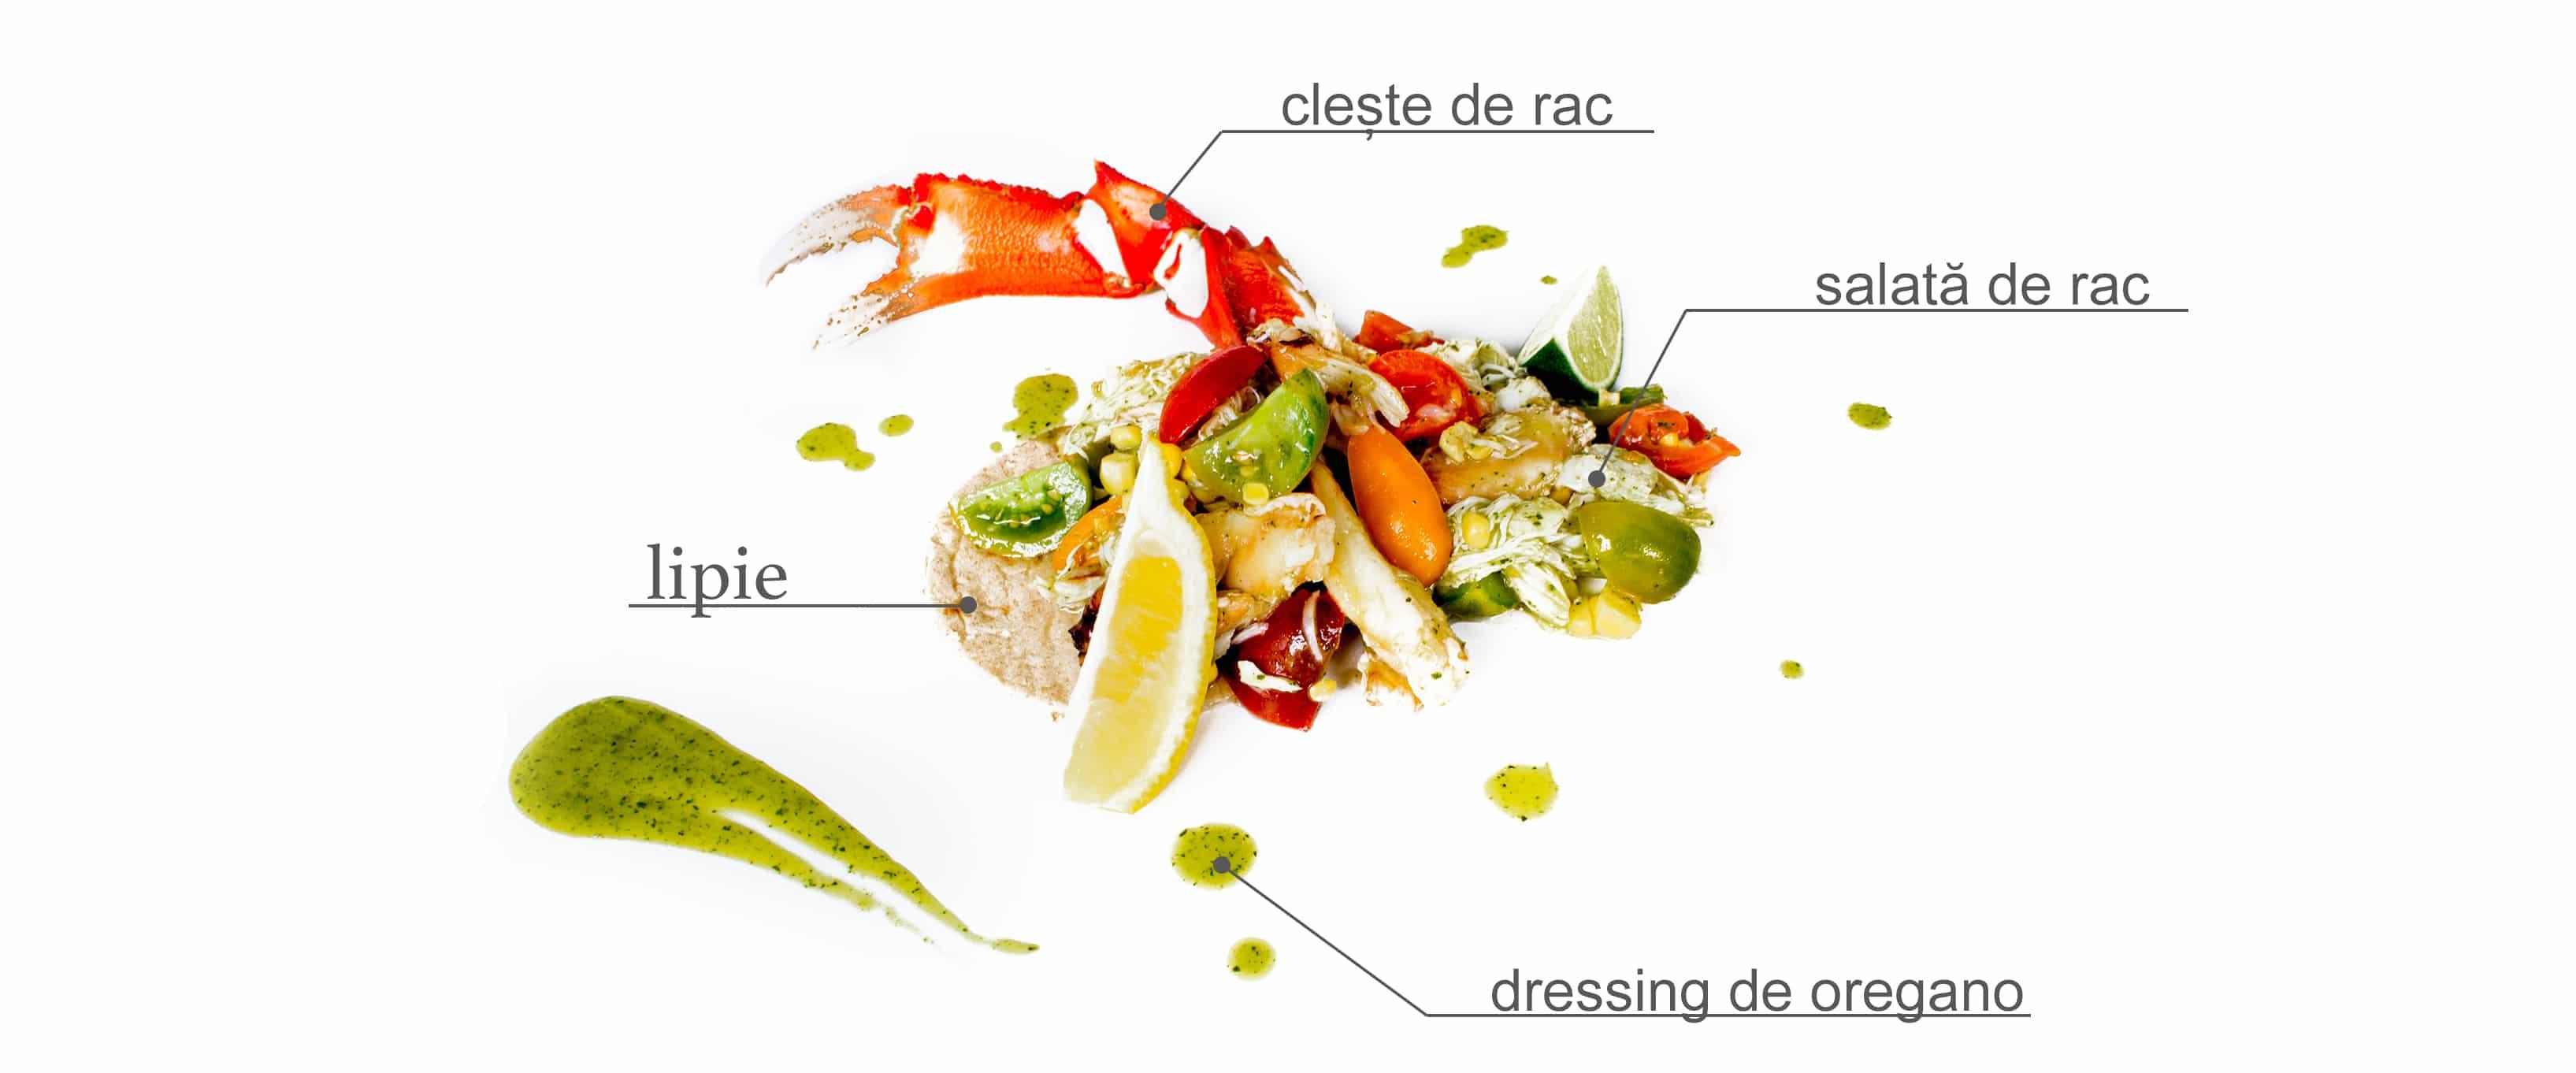 salata de rac